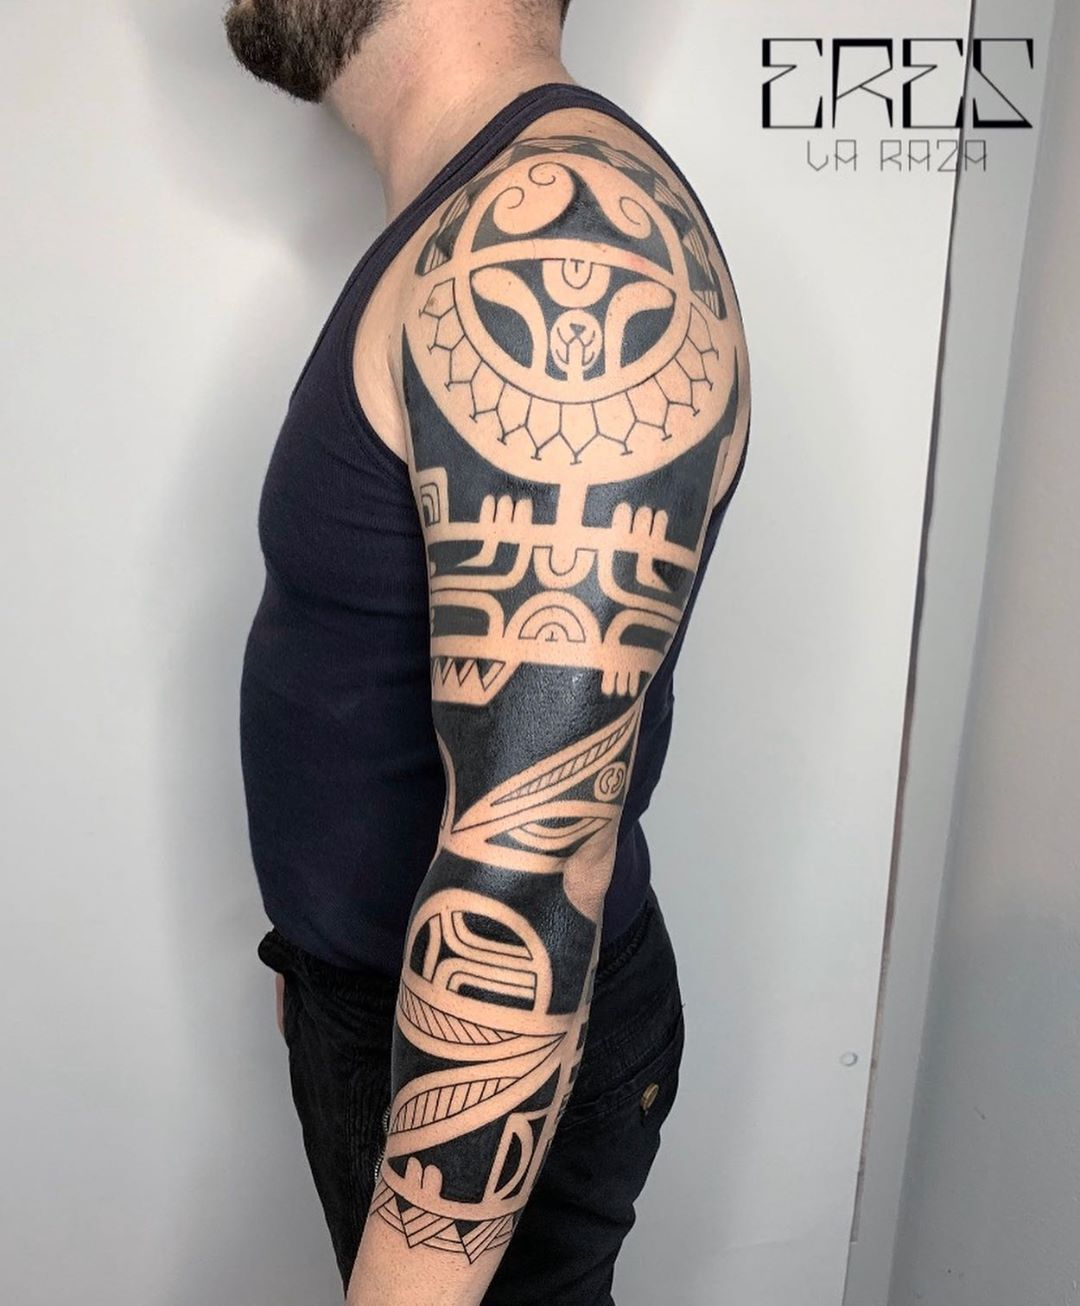 Inspired marquesan arm? Facebook: eres_la_raza_tattooerEmail::emanucnt@gmail.com#samoan tattoo #freehand #pacific #tattooculturemagazine #thebesttattooartists #inked #tattooworkers #tattoolife #tattoosocial #tattooartistmagazine #inkedmagazine #marquesantattoo #freehandtattoo #tribaltataucollective  #blacktattoo #tattoomagazine #freehandtattoo #pacifictattoo #tribaltattoo #tribal #tattoolife #ereslarazatattooer #tribaltattoos #samontattoo   Artist: @ereslarazatattooer